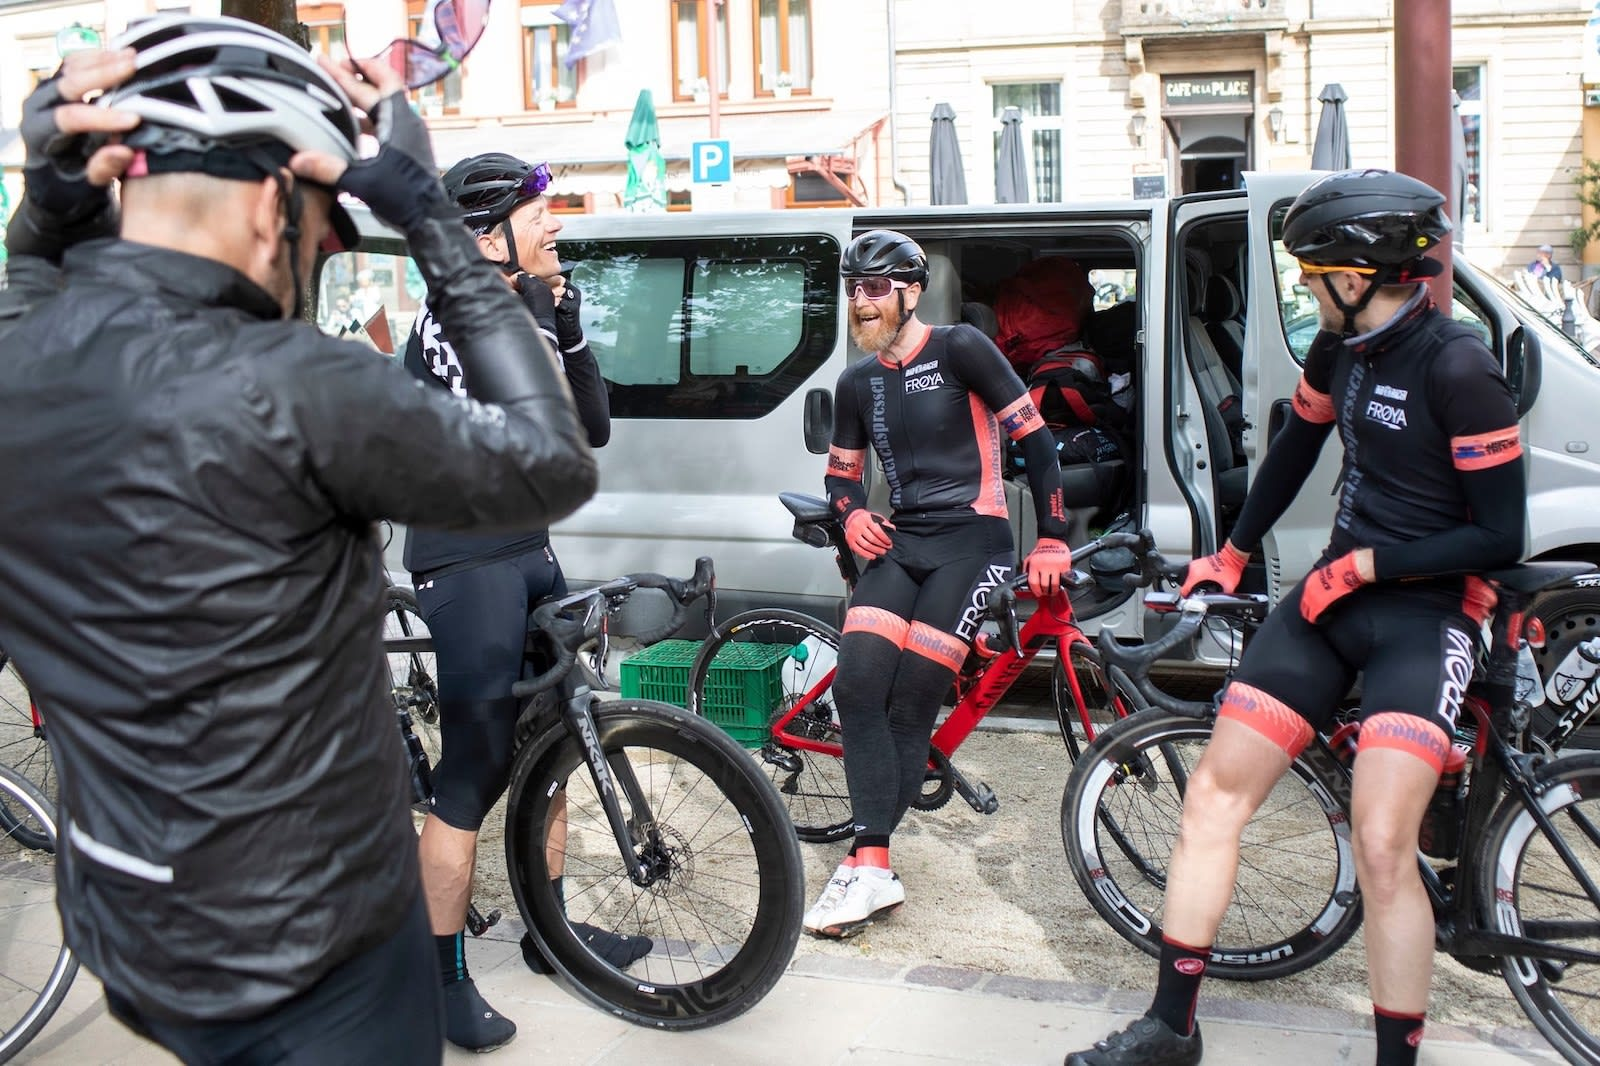 FORVENTNINGSFULLE:  Ilya Cantor, Steinar Reinkind, Fred Thoresen og Hans J. Rambech klare for ny dag på den belgiske landeveien. Foto Rupert Hartley